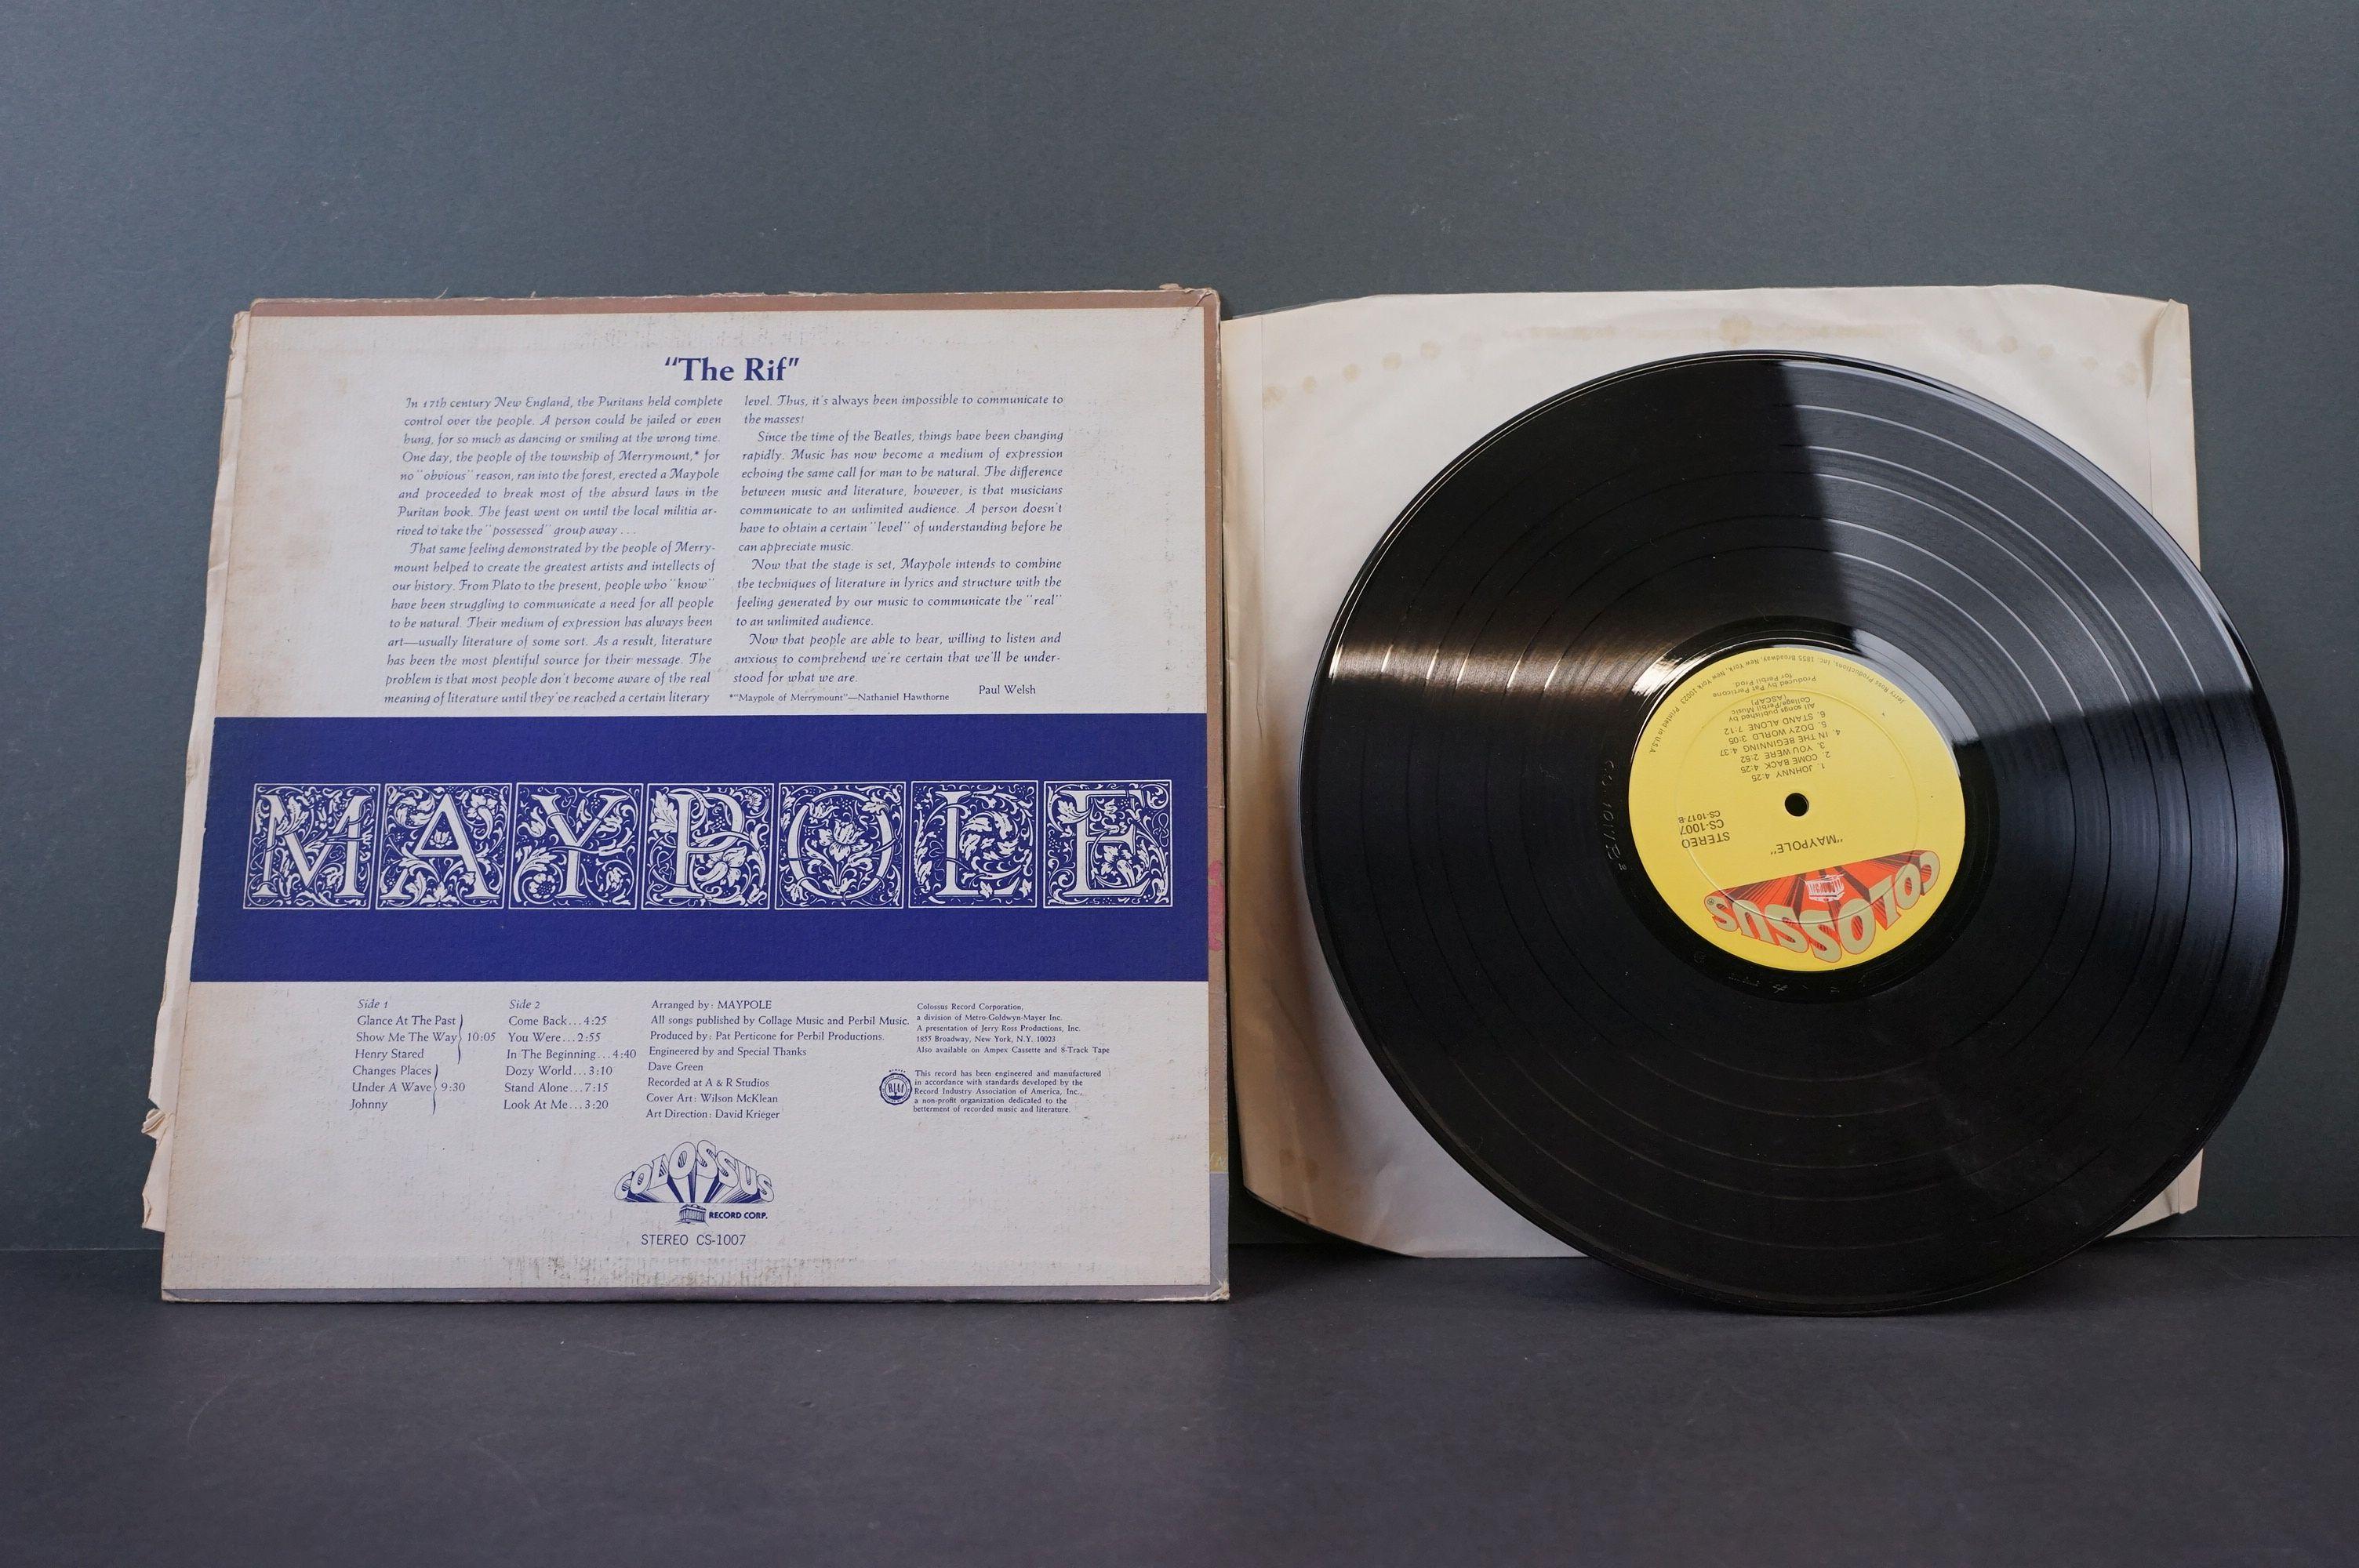 Vinyl - Psych - Three original Rare US pressing Psych albums. Maypole - Maypole (1971 US, Colossus - Image 3 of 8